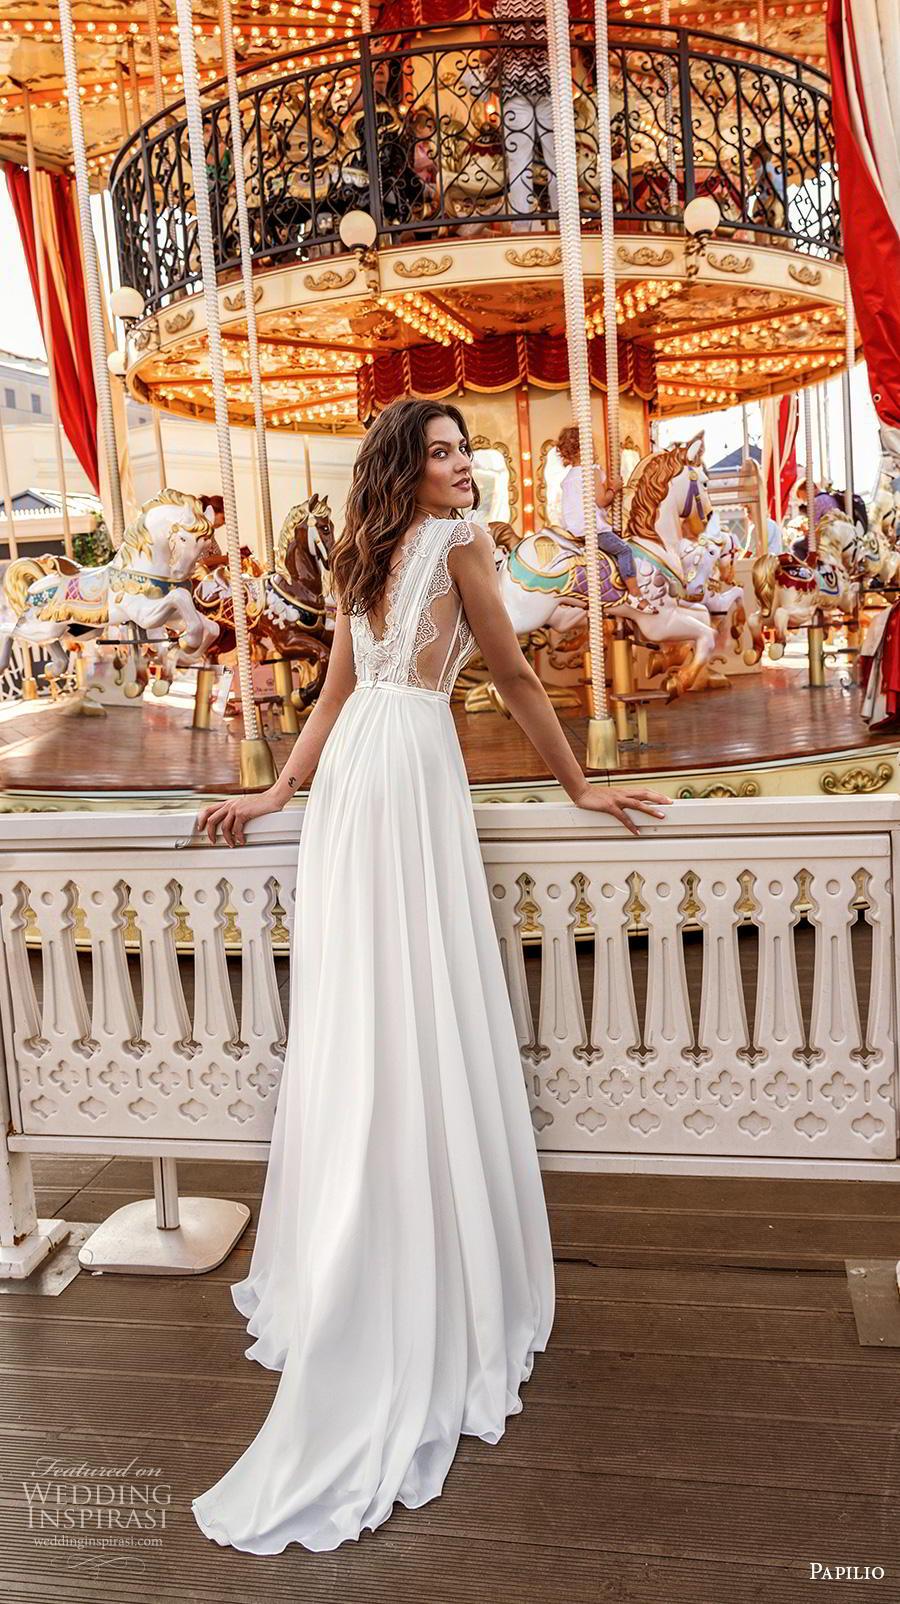 papilio 2019 bridal sleeveless with strap deep v neck lightly embellished ruched bodice romantic soft a  line wedding dress v back chapel train (7) bv